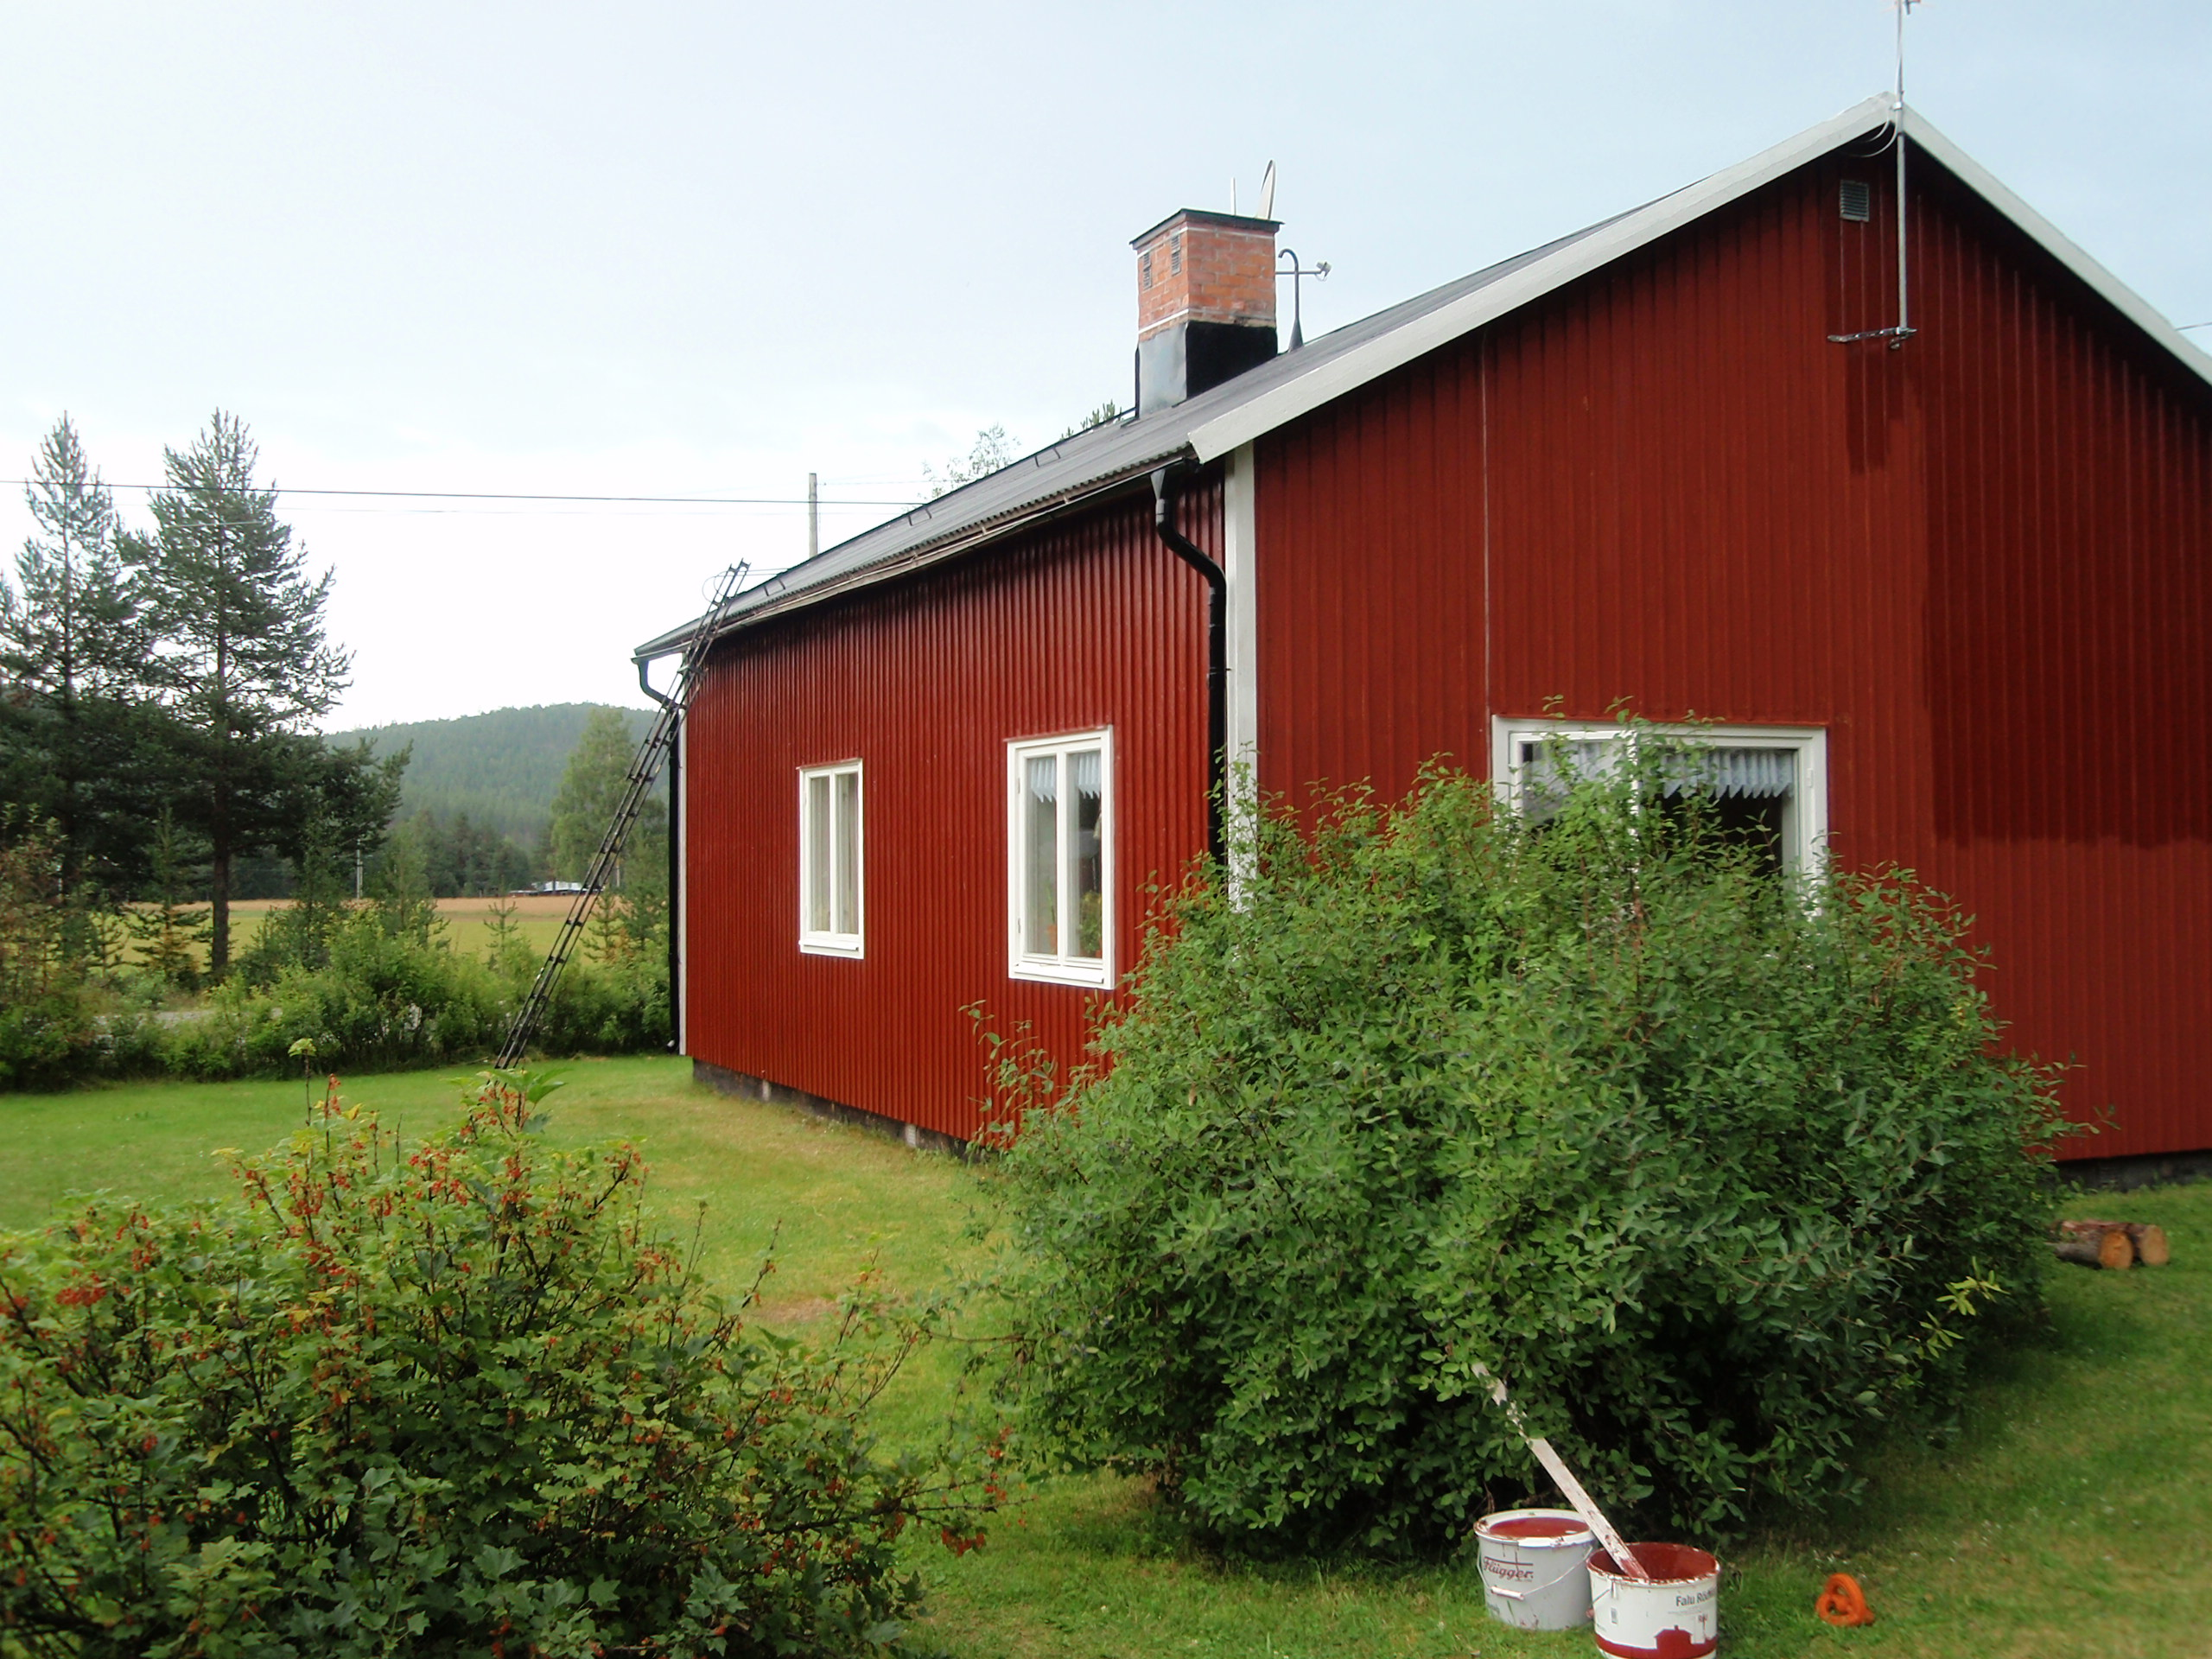 schwedenhaus in schweden in moskosel immobilien. Black Bedroom Furniture Sets. Home Design Ideas